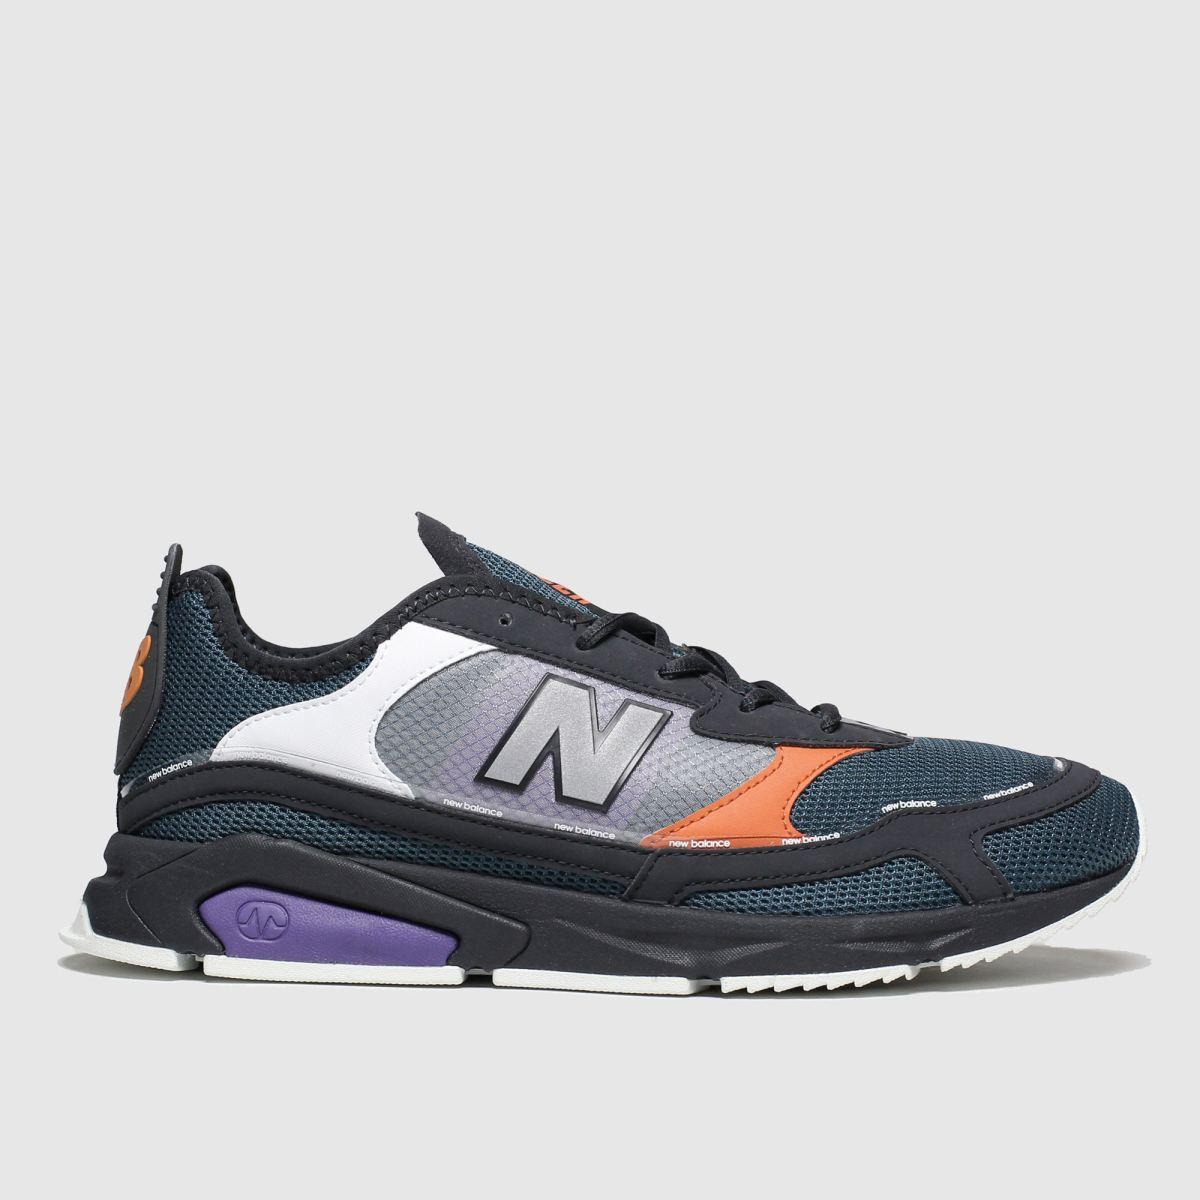 New Balance New Balance Black & Orange Xrc Trainers